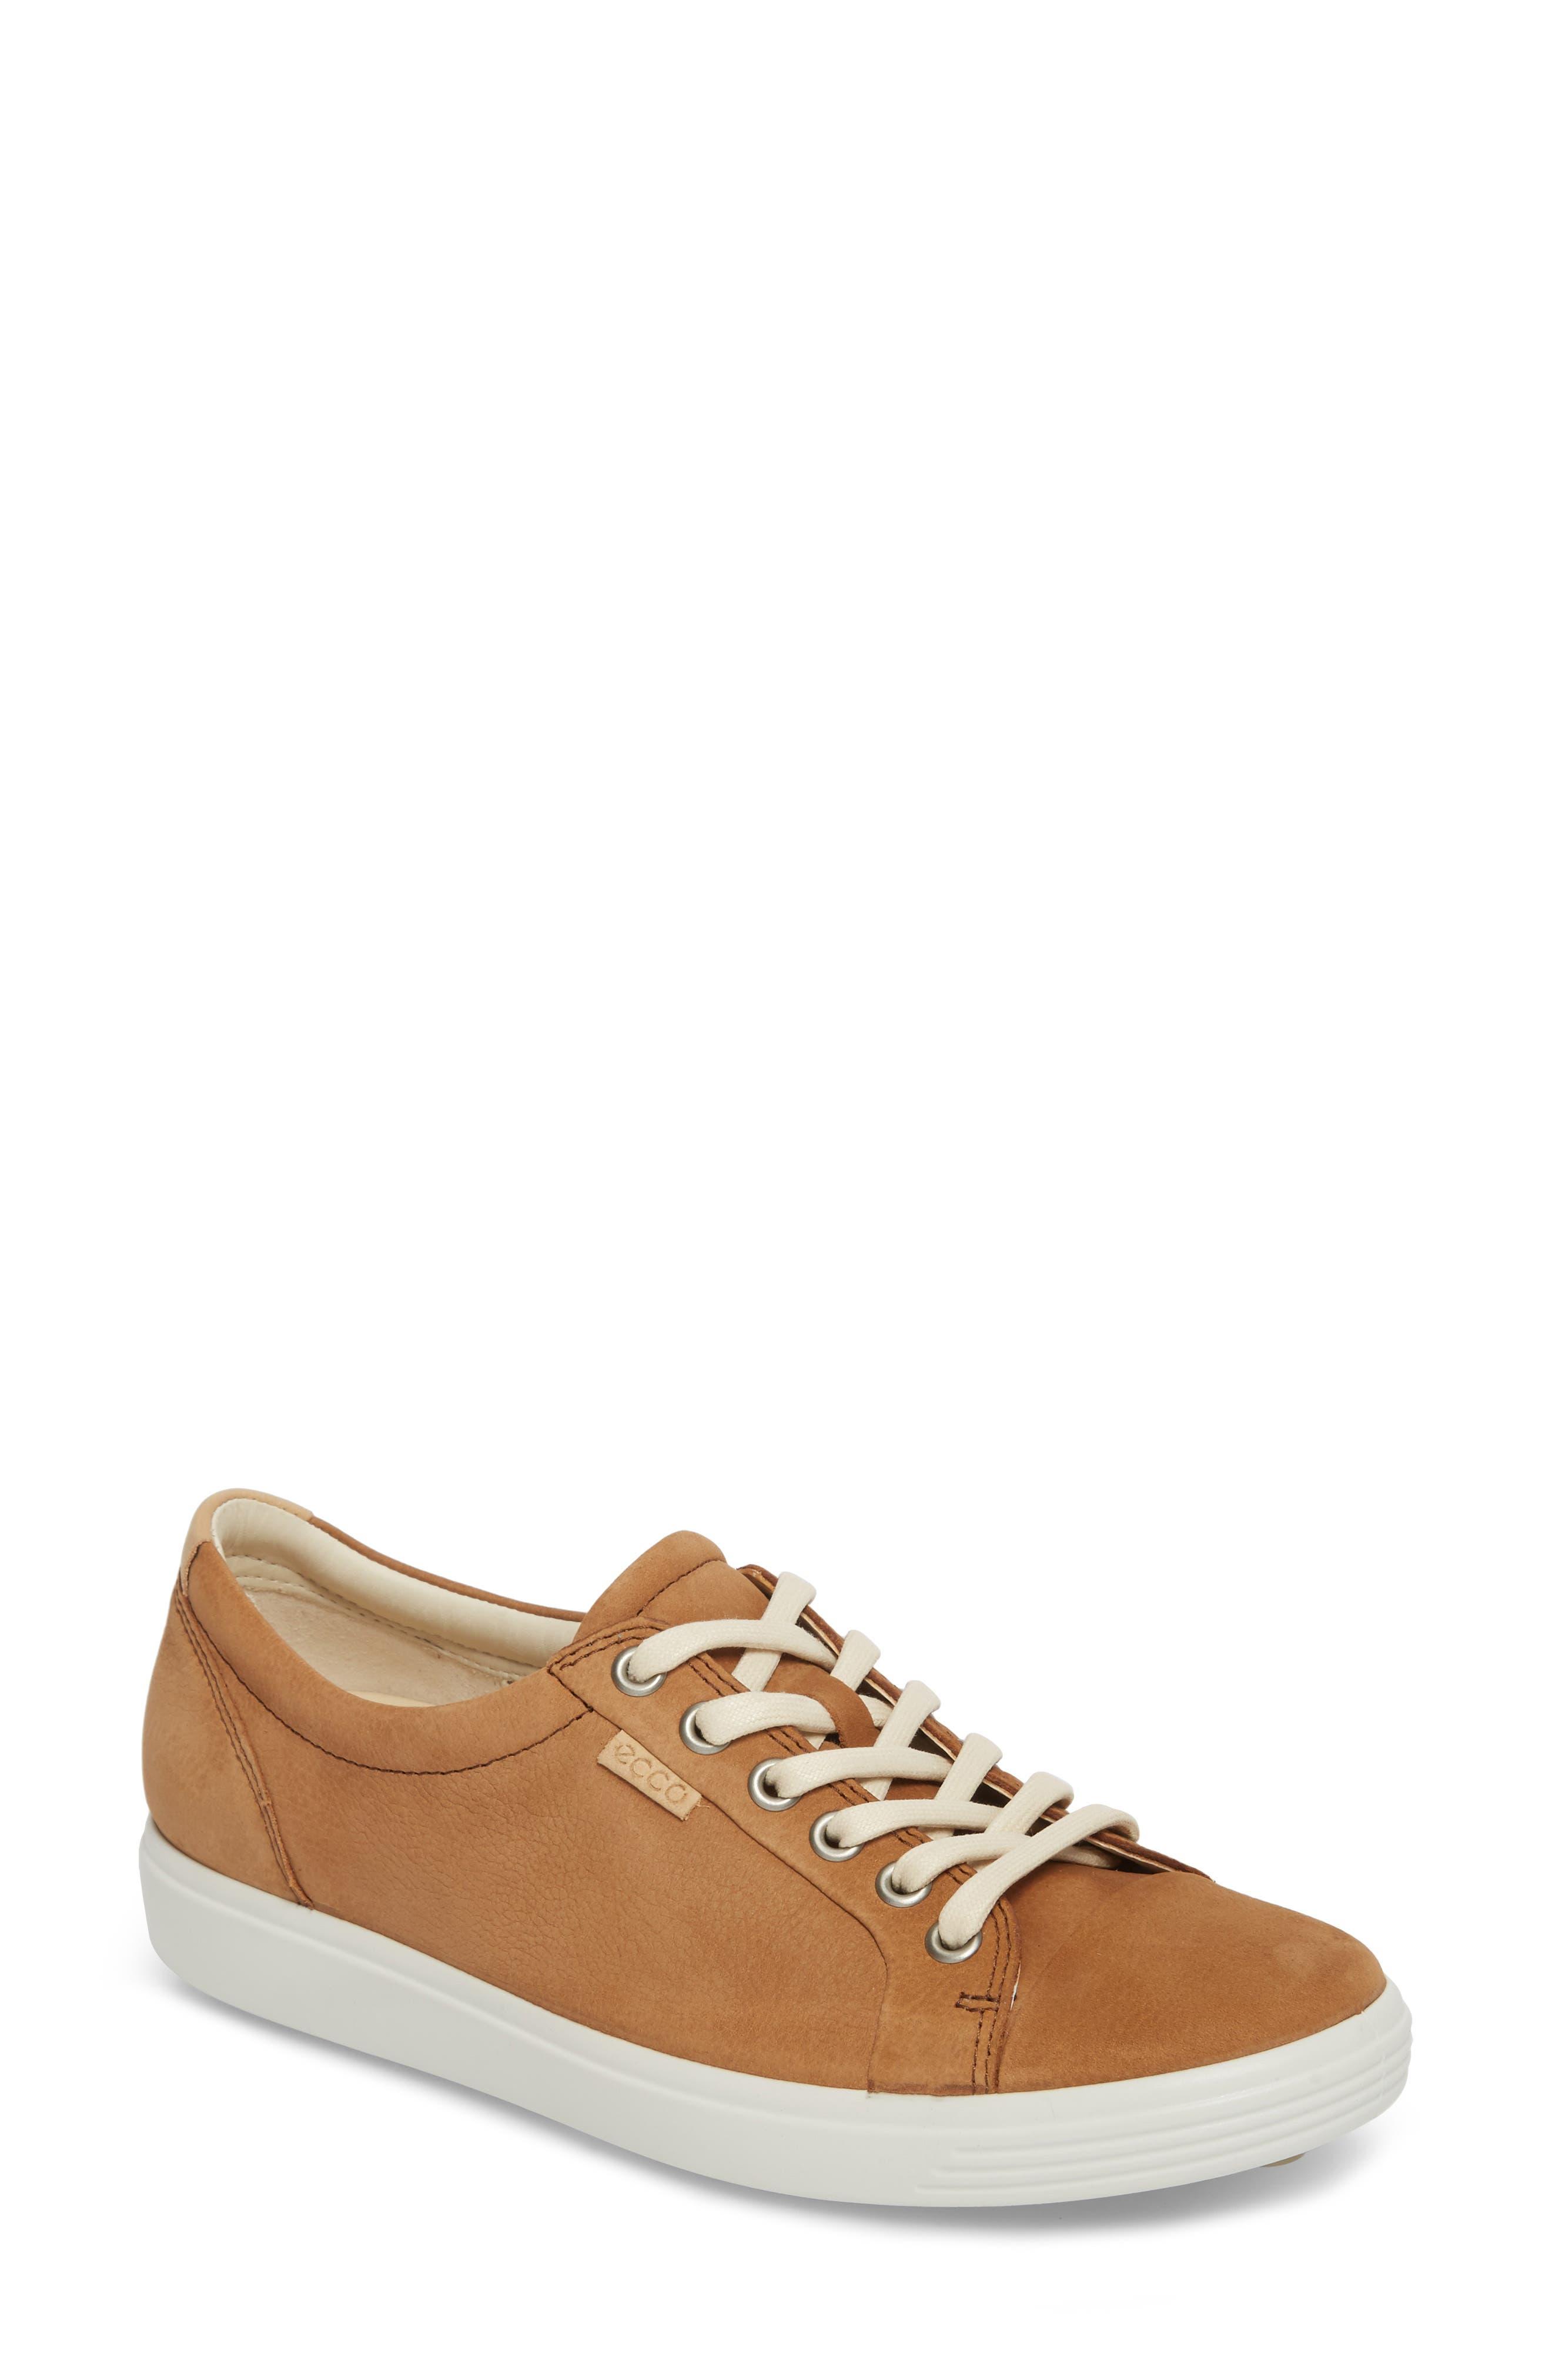 ,                             Soft 7 Sneaker,                             Main thumbnail 258, color,                             218